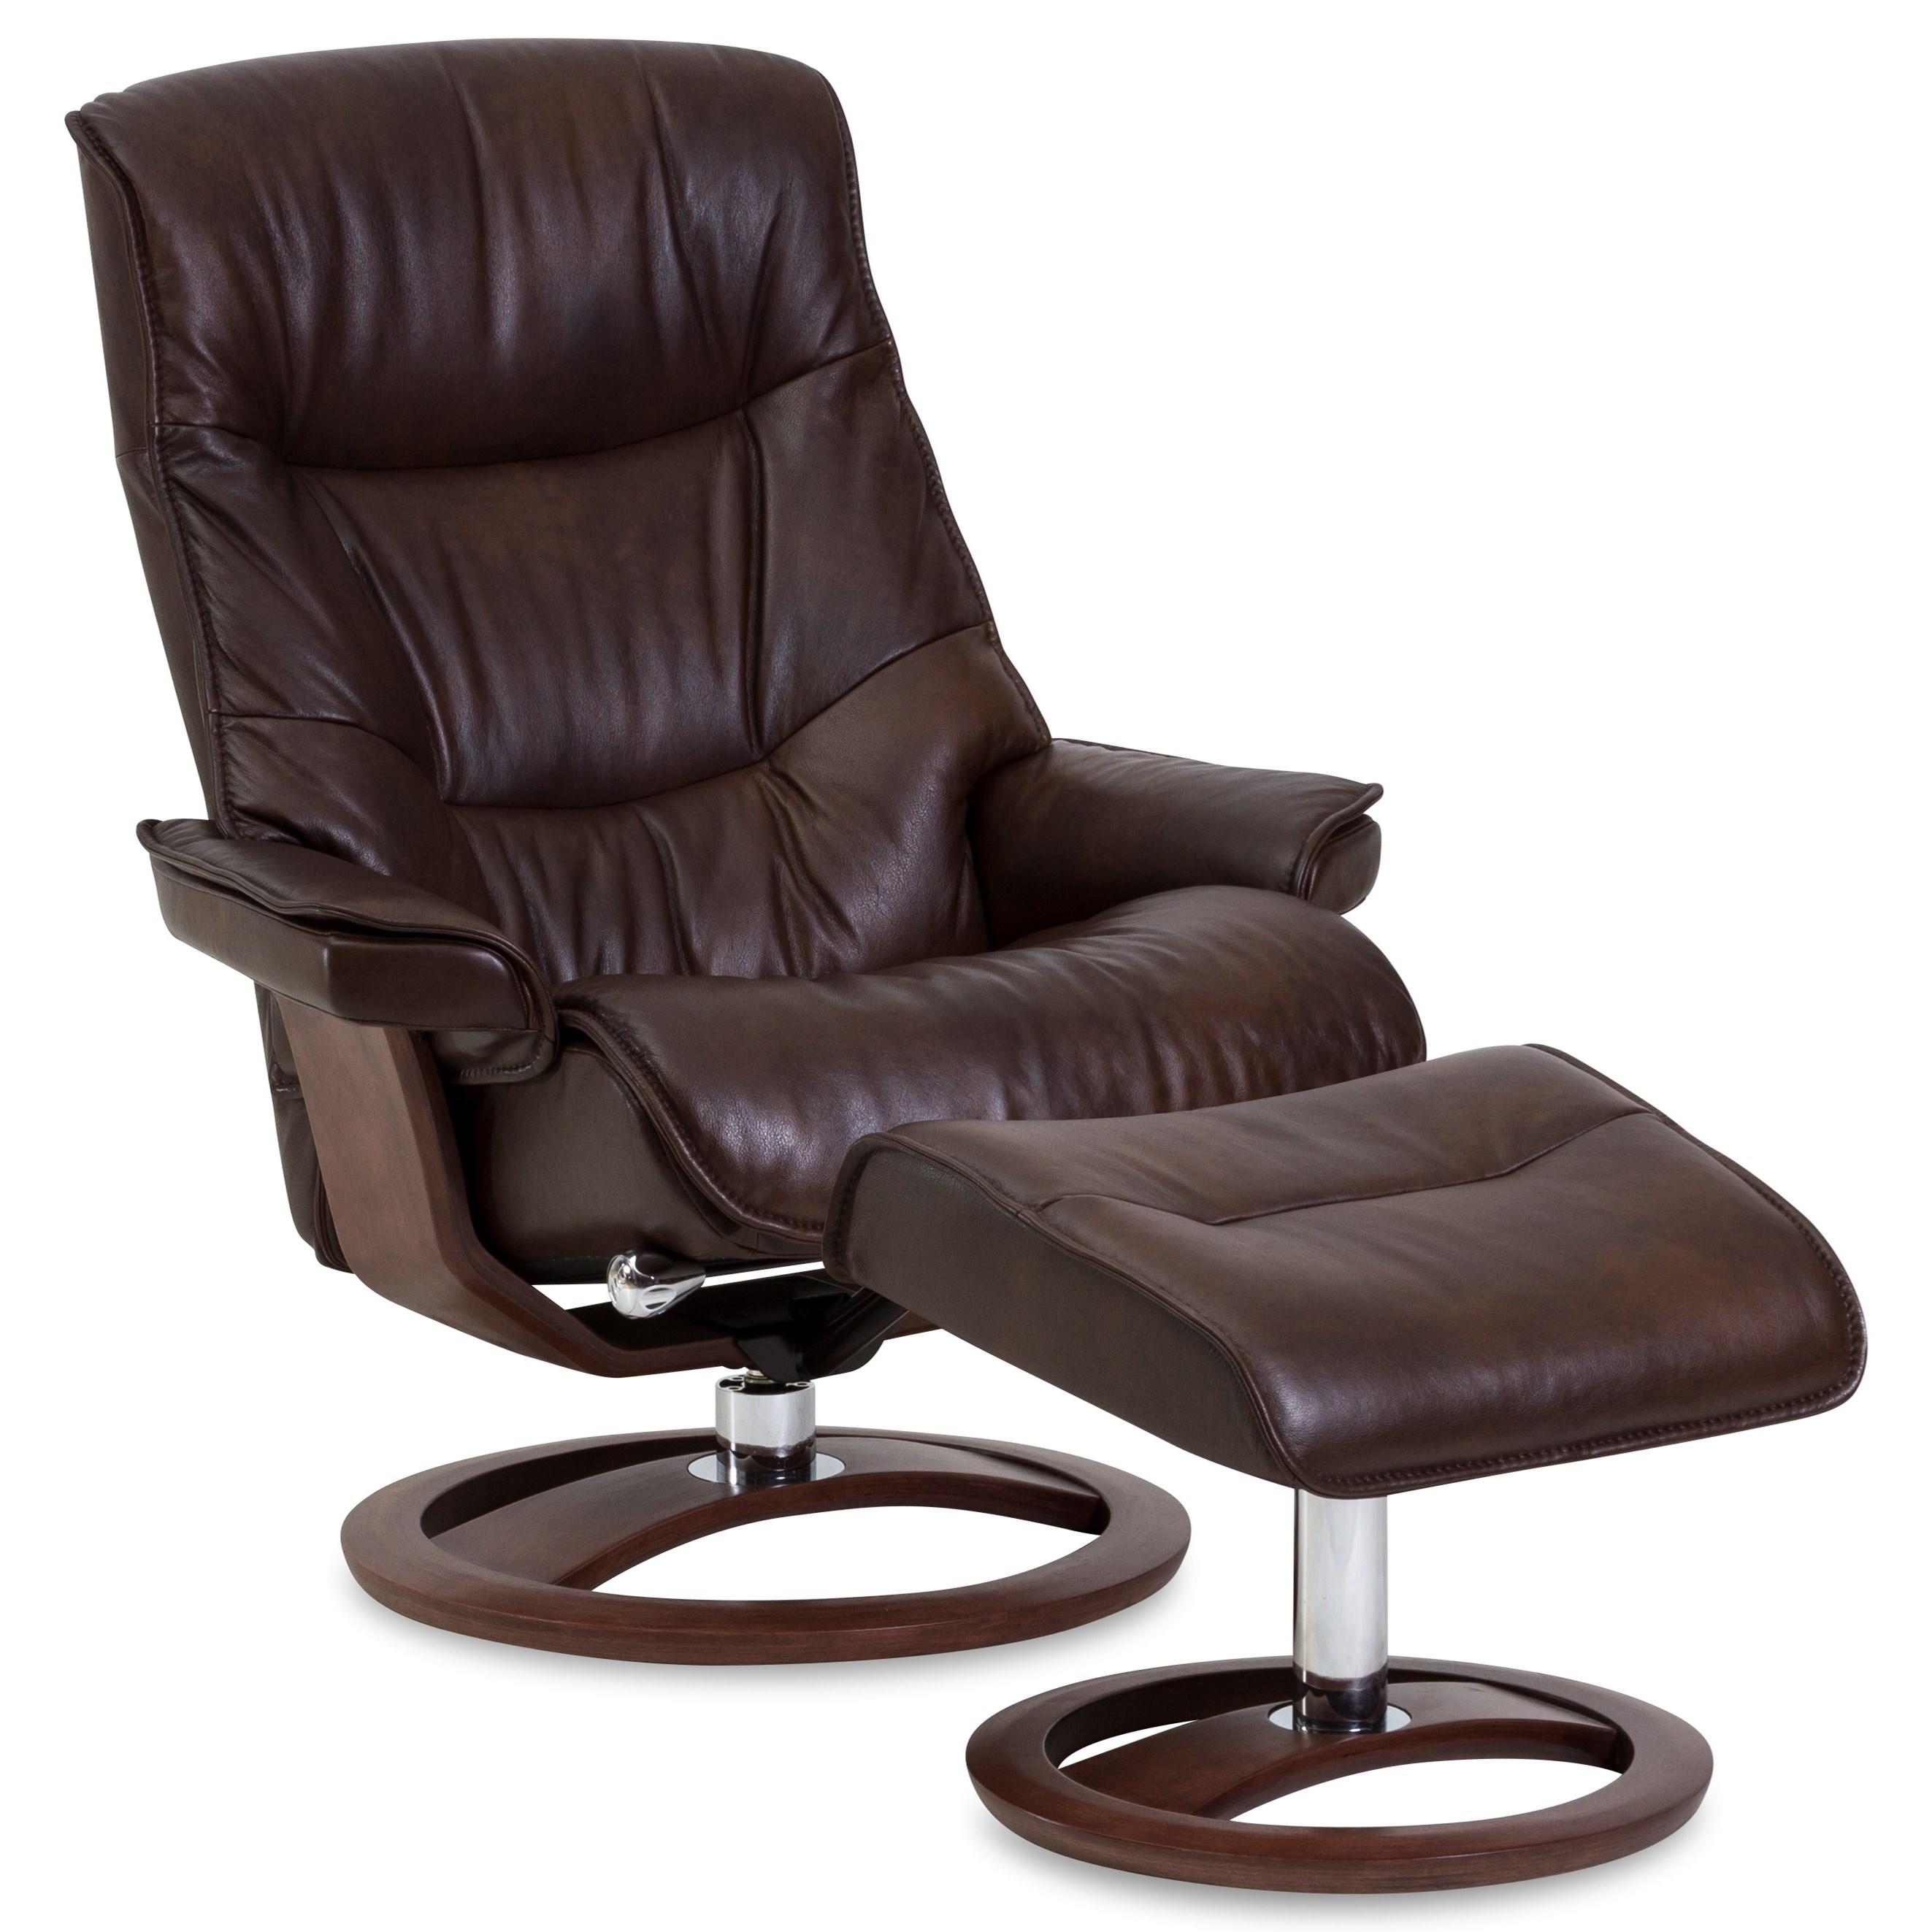 Movies black leatherette cushion swivel recliner malayali